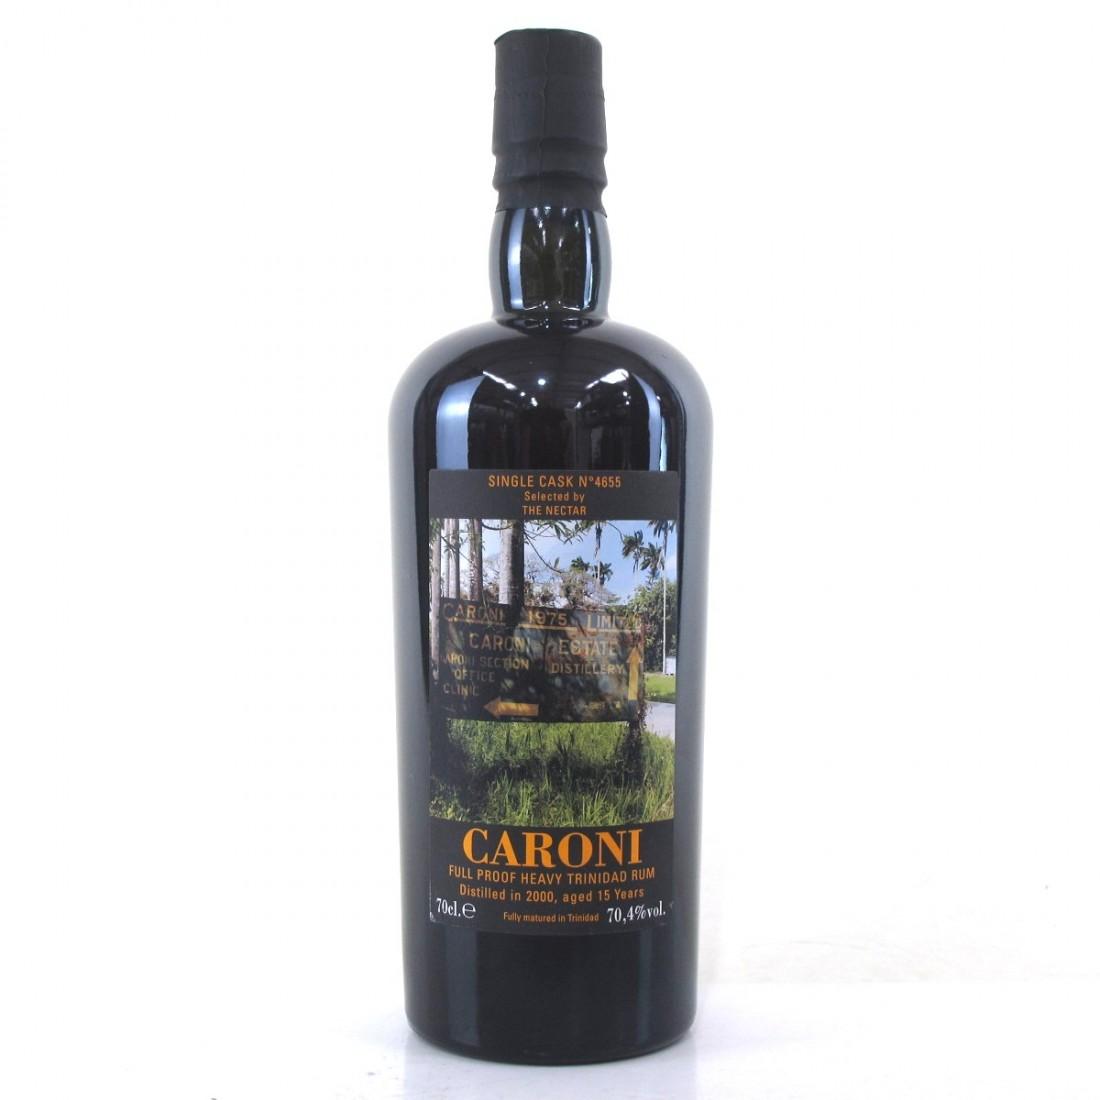 Caroni 2000 Single Cask 15 Year Old #4655 / The Nectar